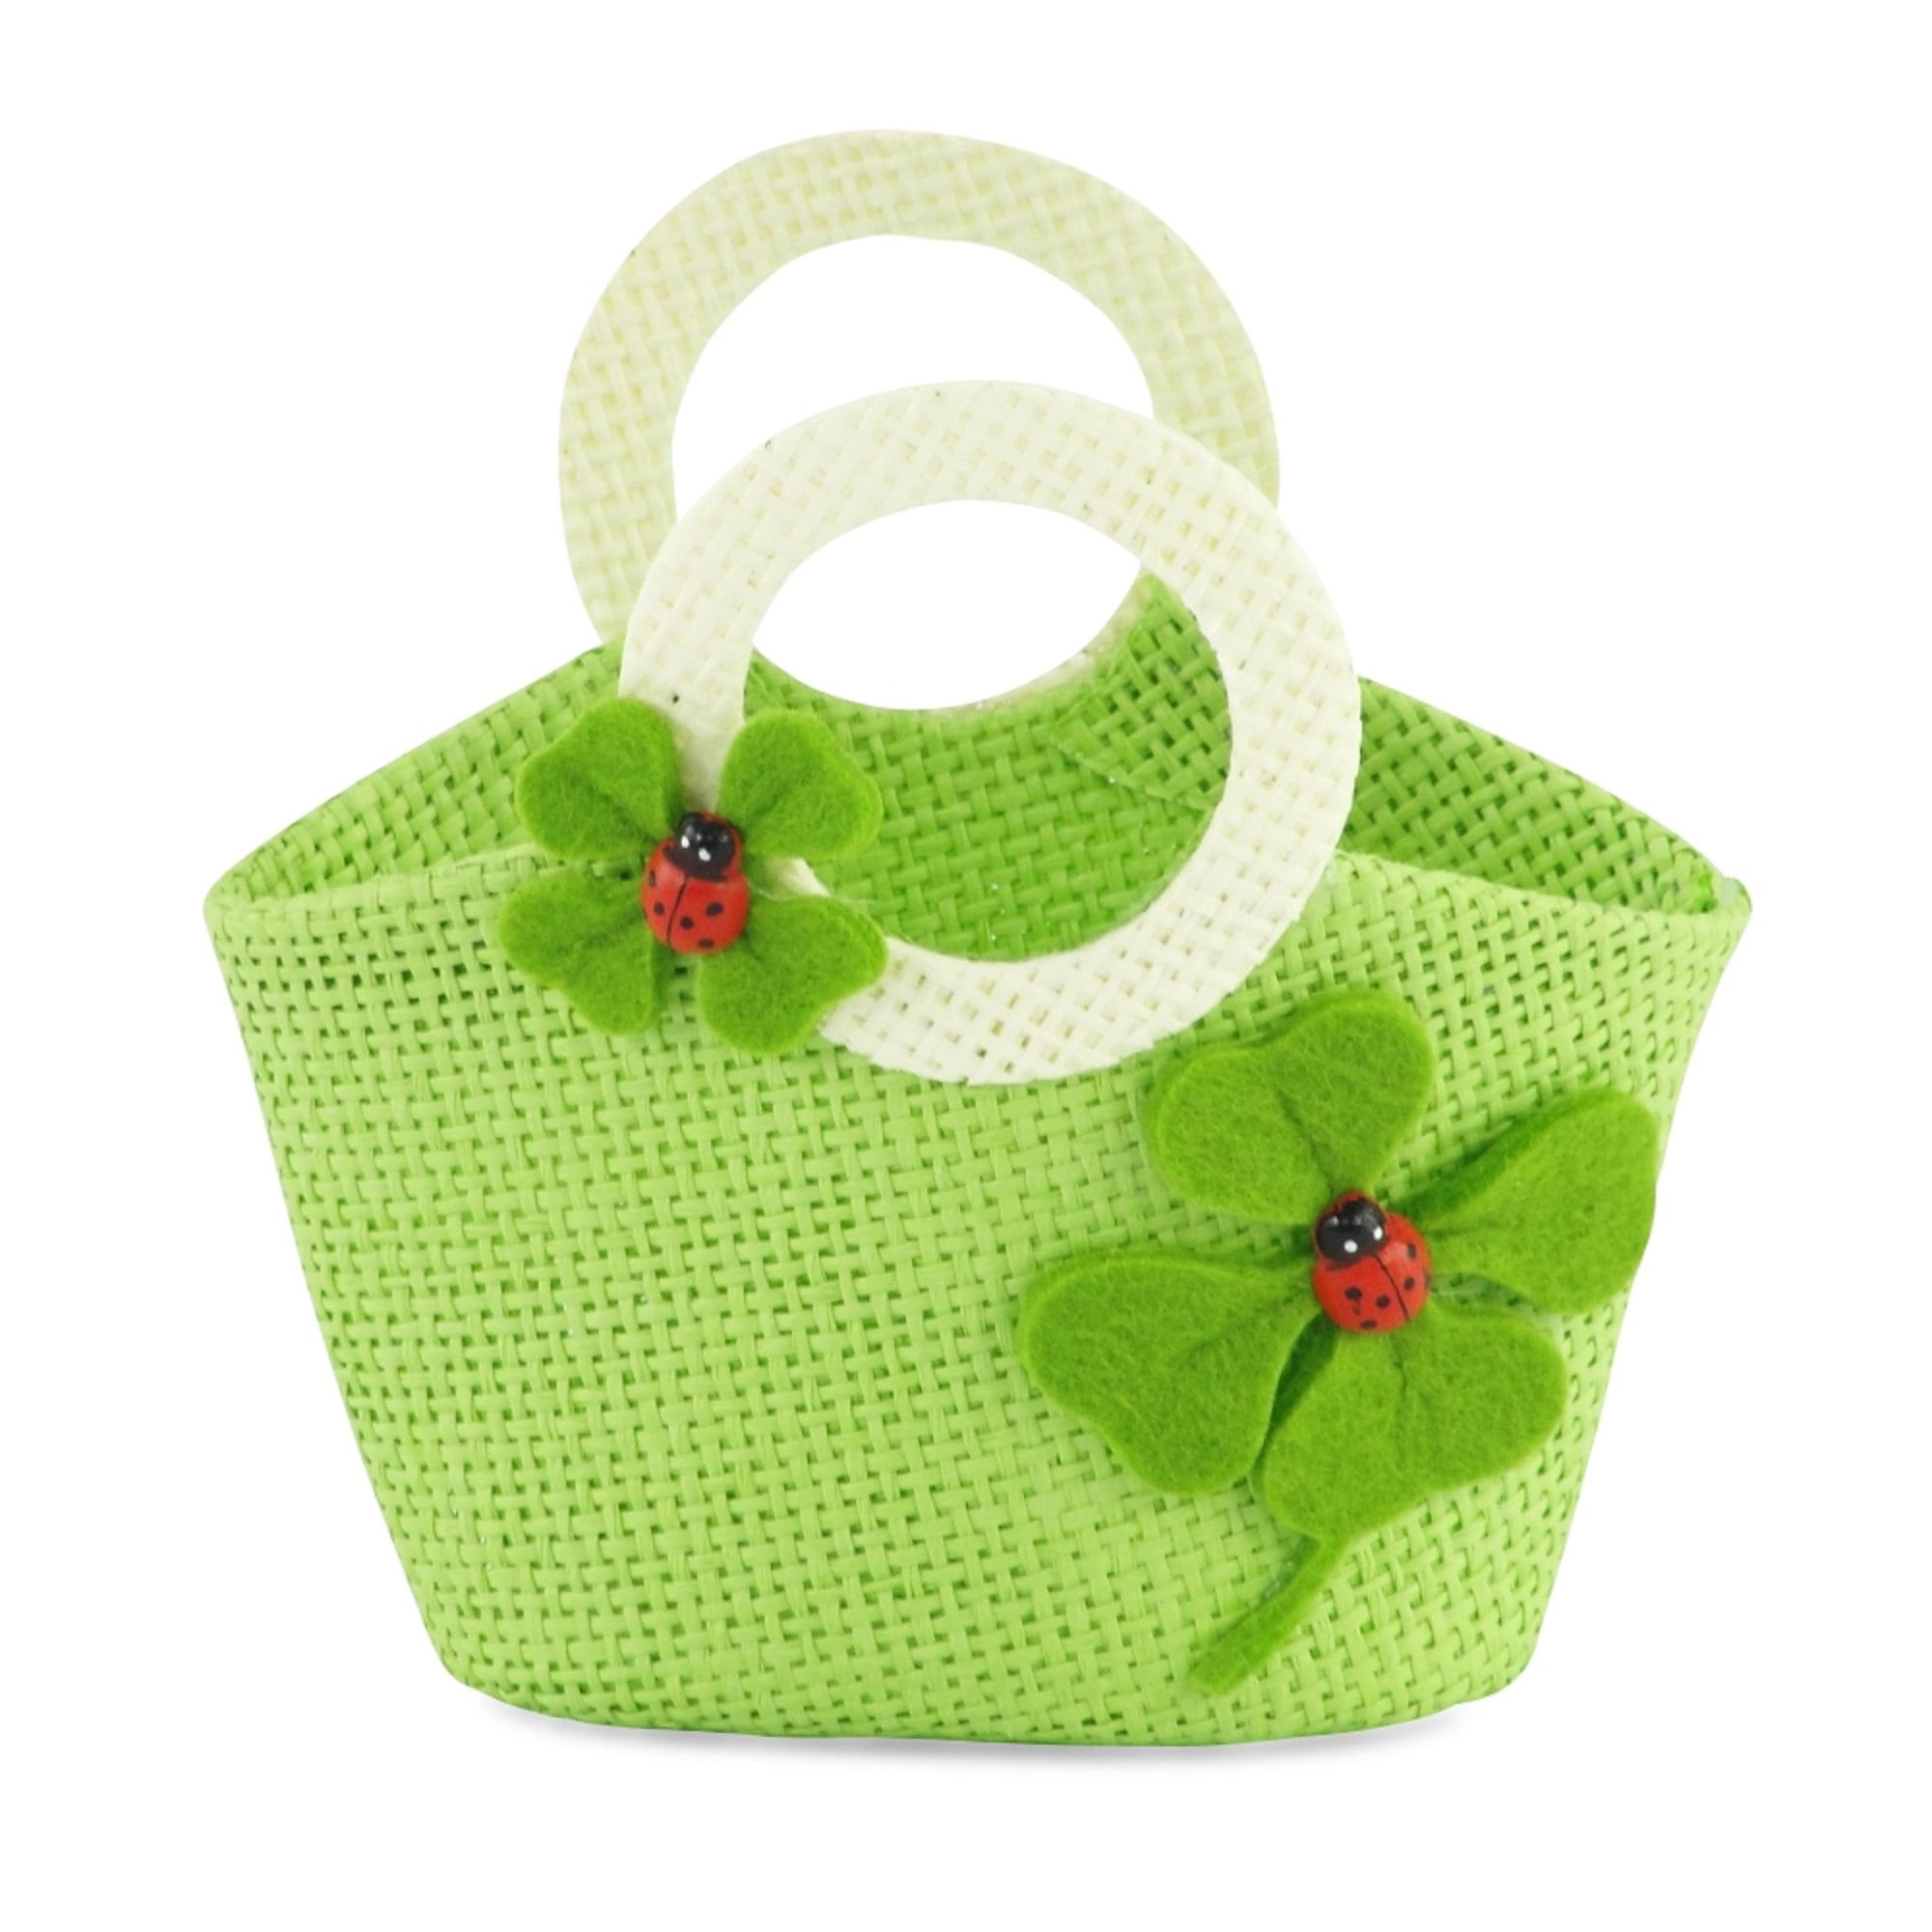 18-inch Doll Accessories | Doll-Sized Woven Green and Cream Ladybug Purse - Handbag | Fits American Girl Dolls